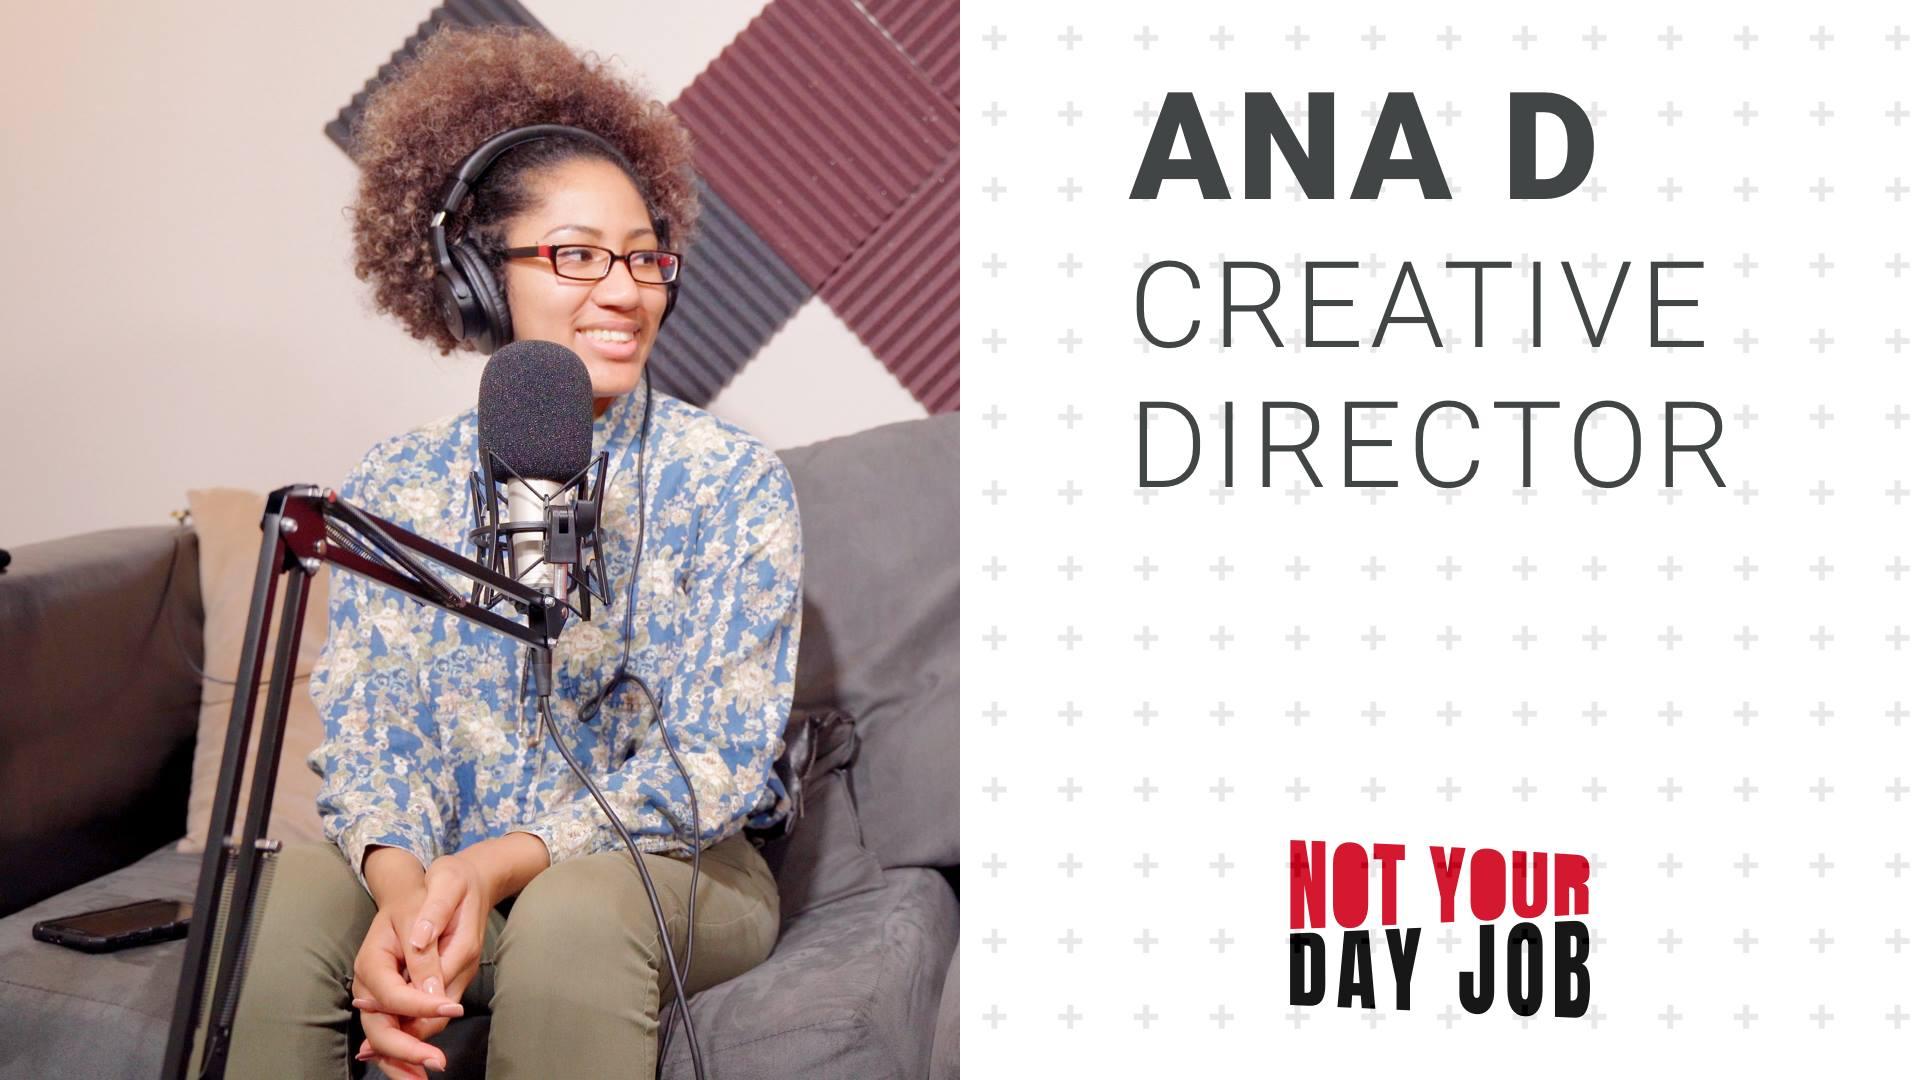 svperdvperfly Not Your Day Job podcast